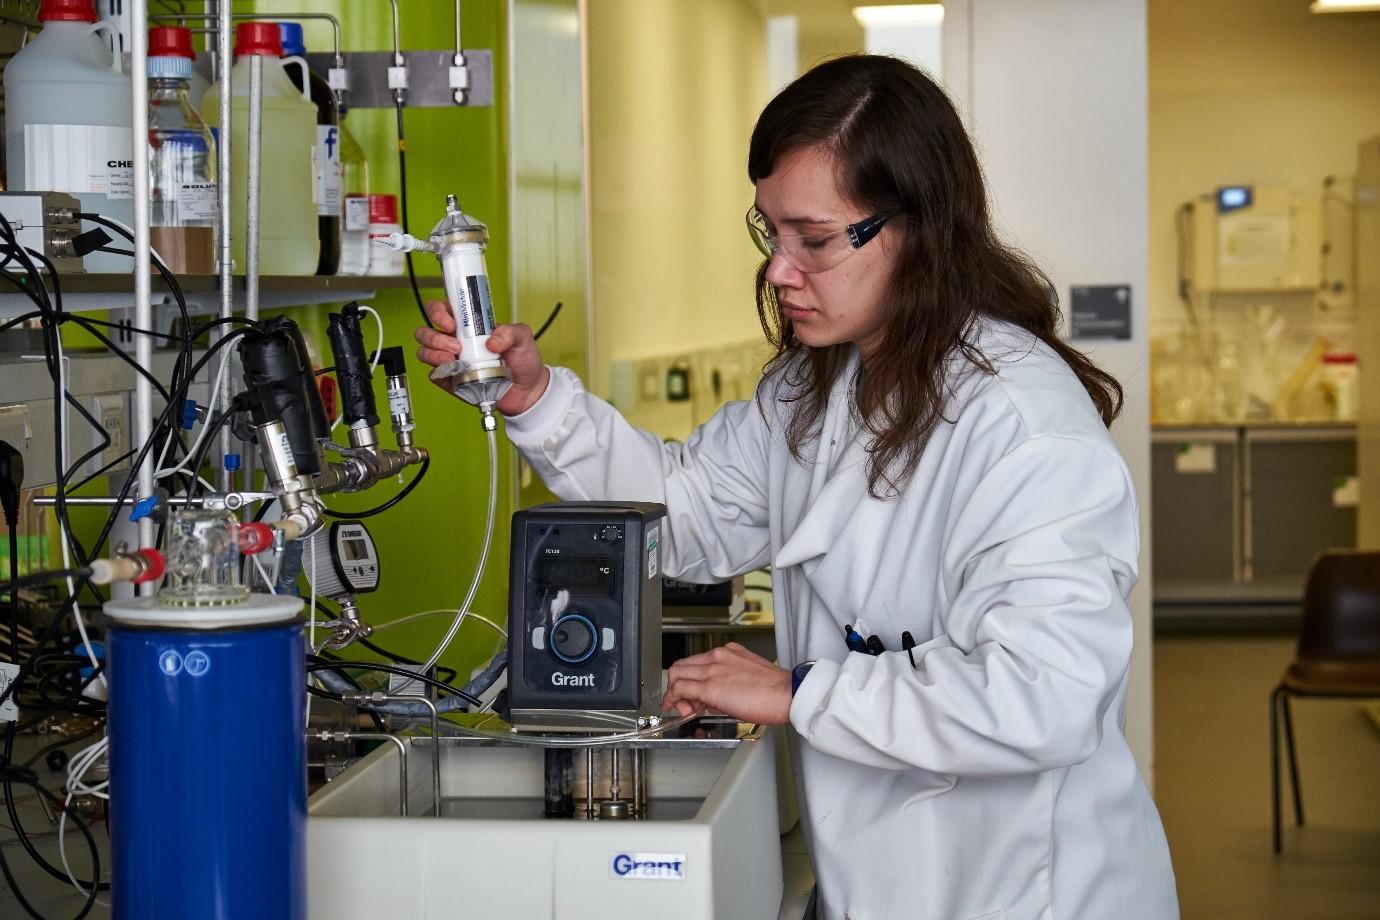 Edwina Mercer in the lab